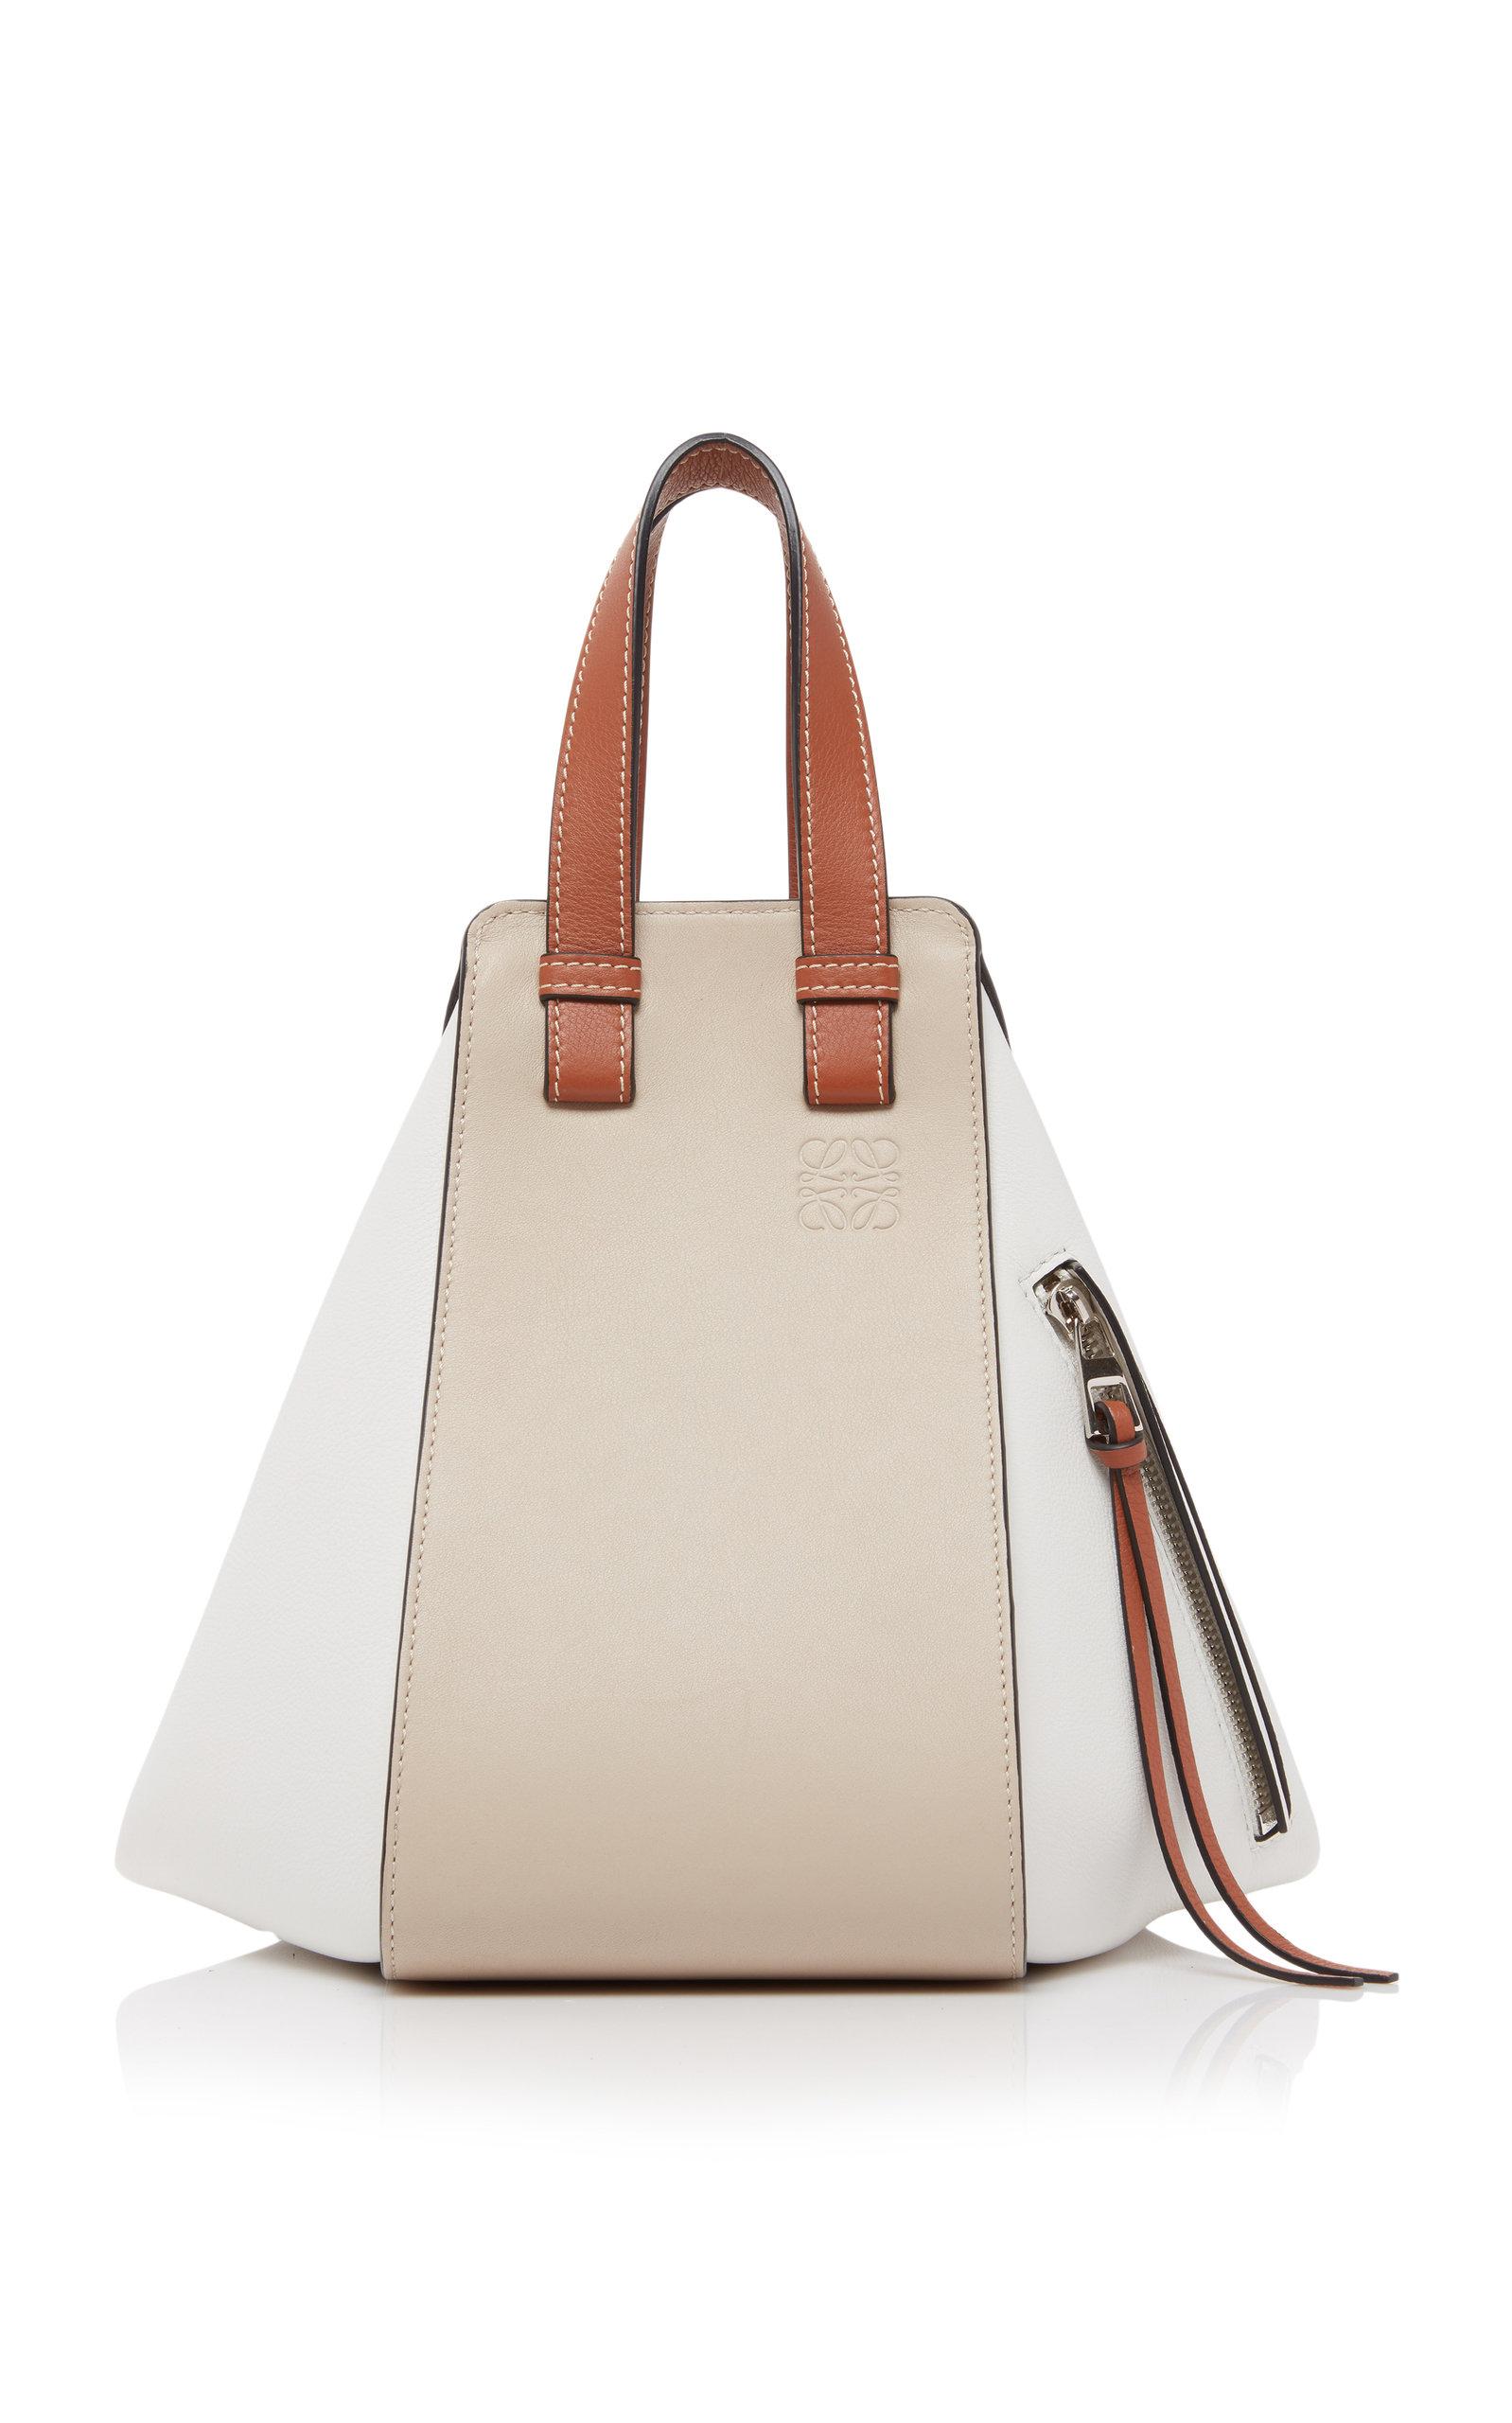 Loewe Small Hammock Color-block Leather Bag In Ivory Multi